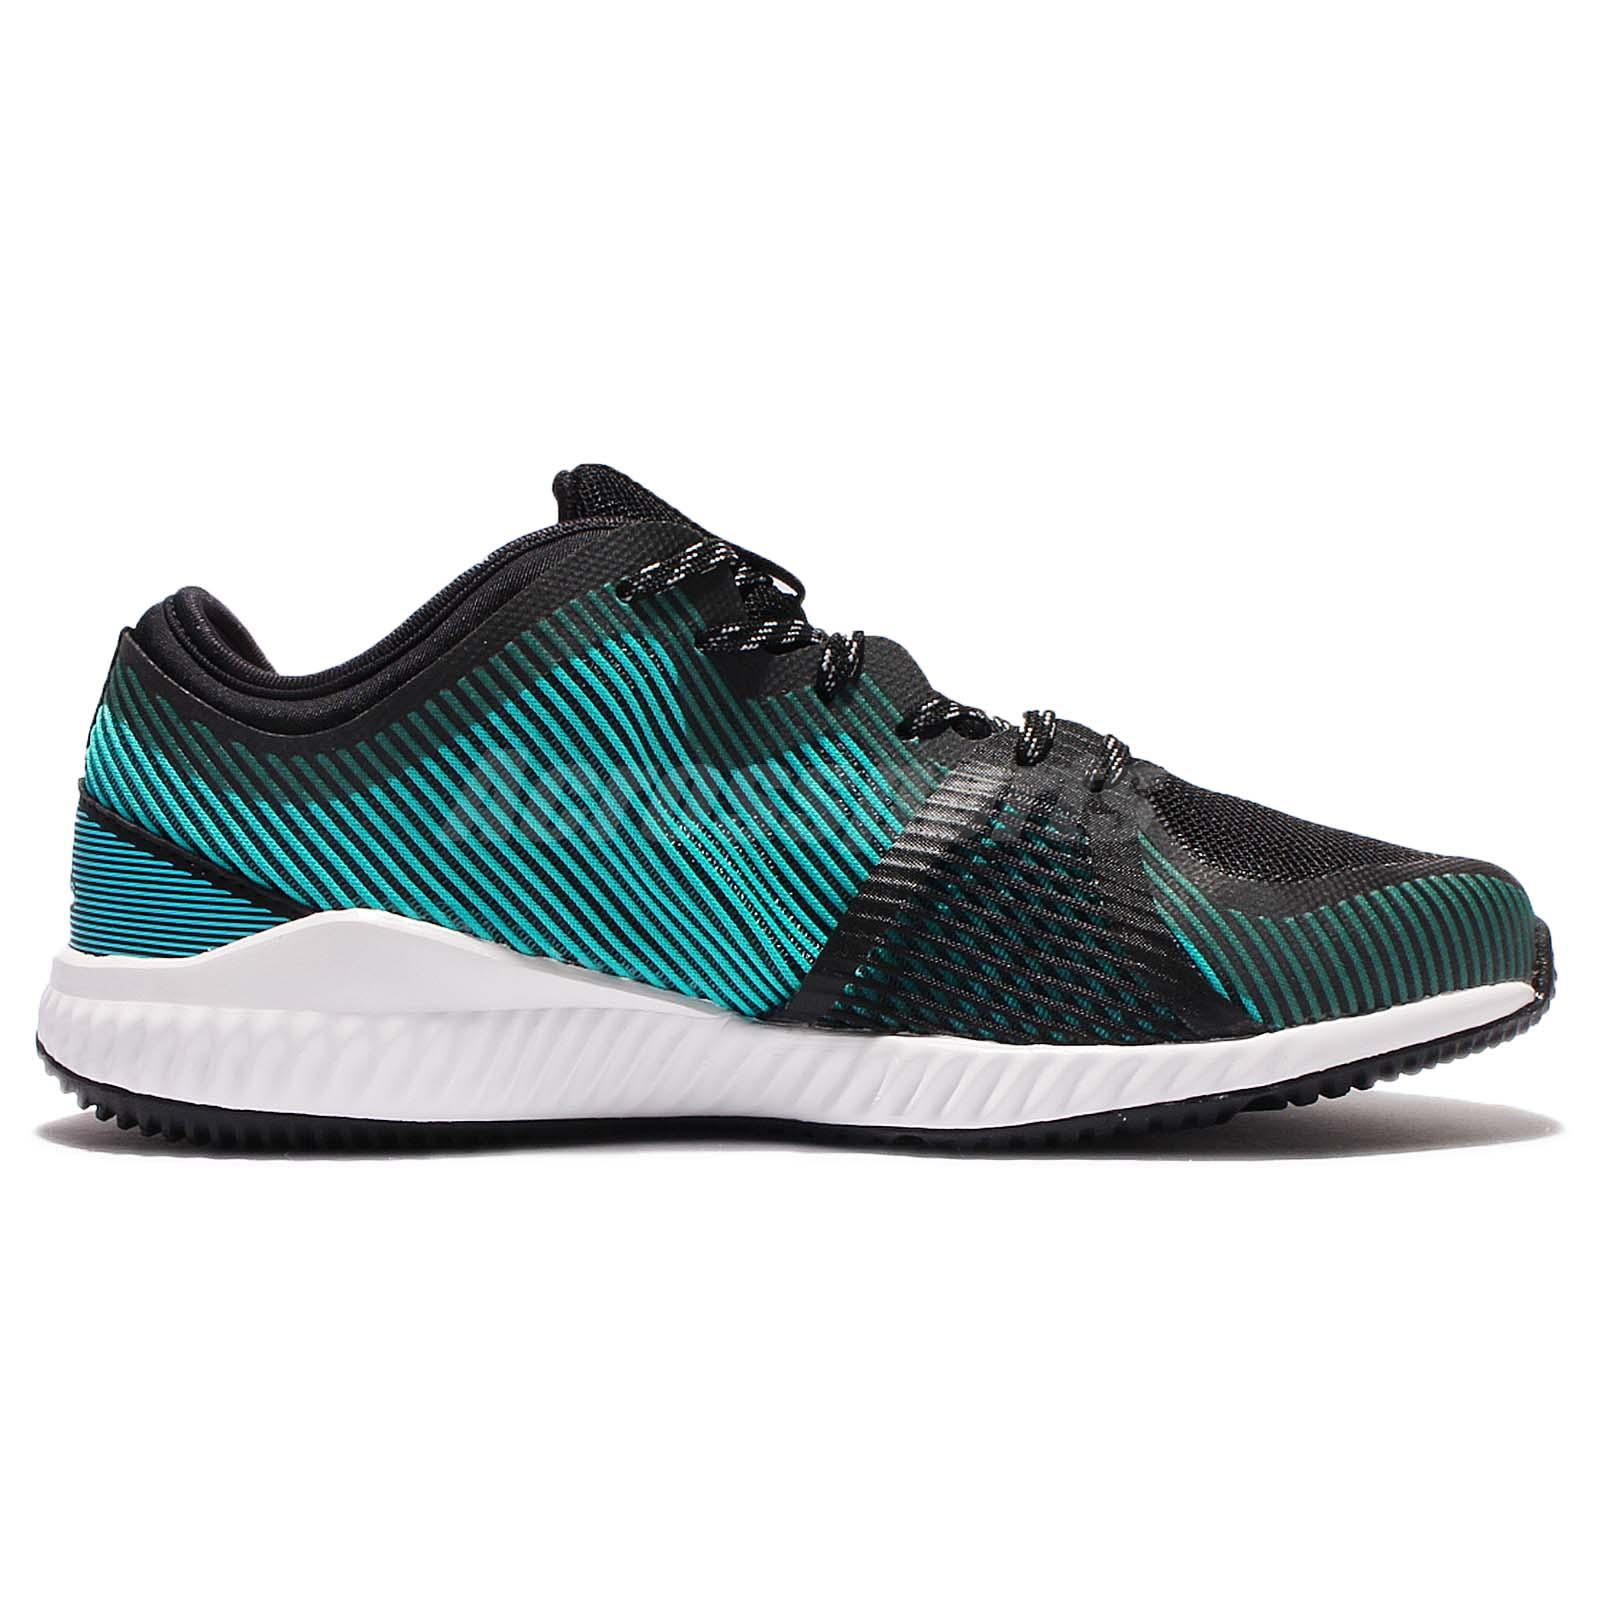 d2cf6660f0c29 adidas CrazyTrain Pro W BOUNCE Black Green Women Training Shoes ...